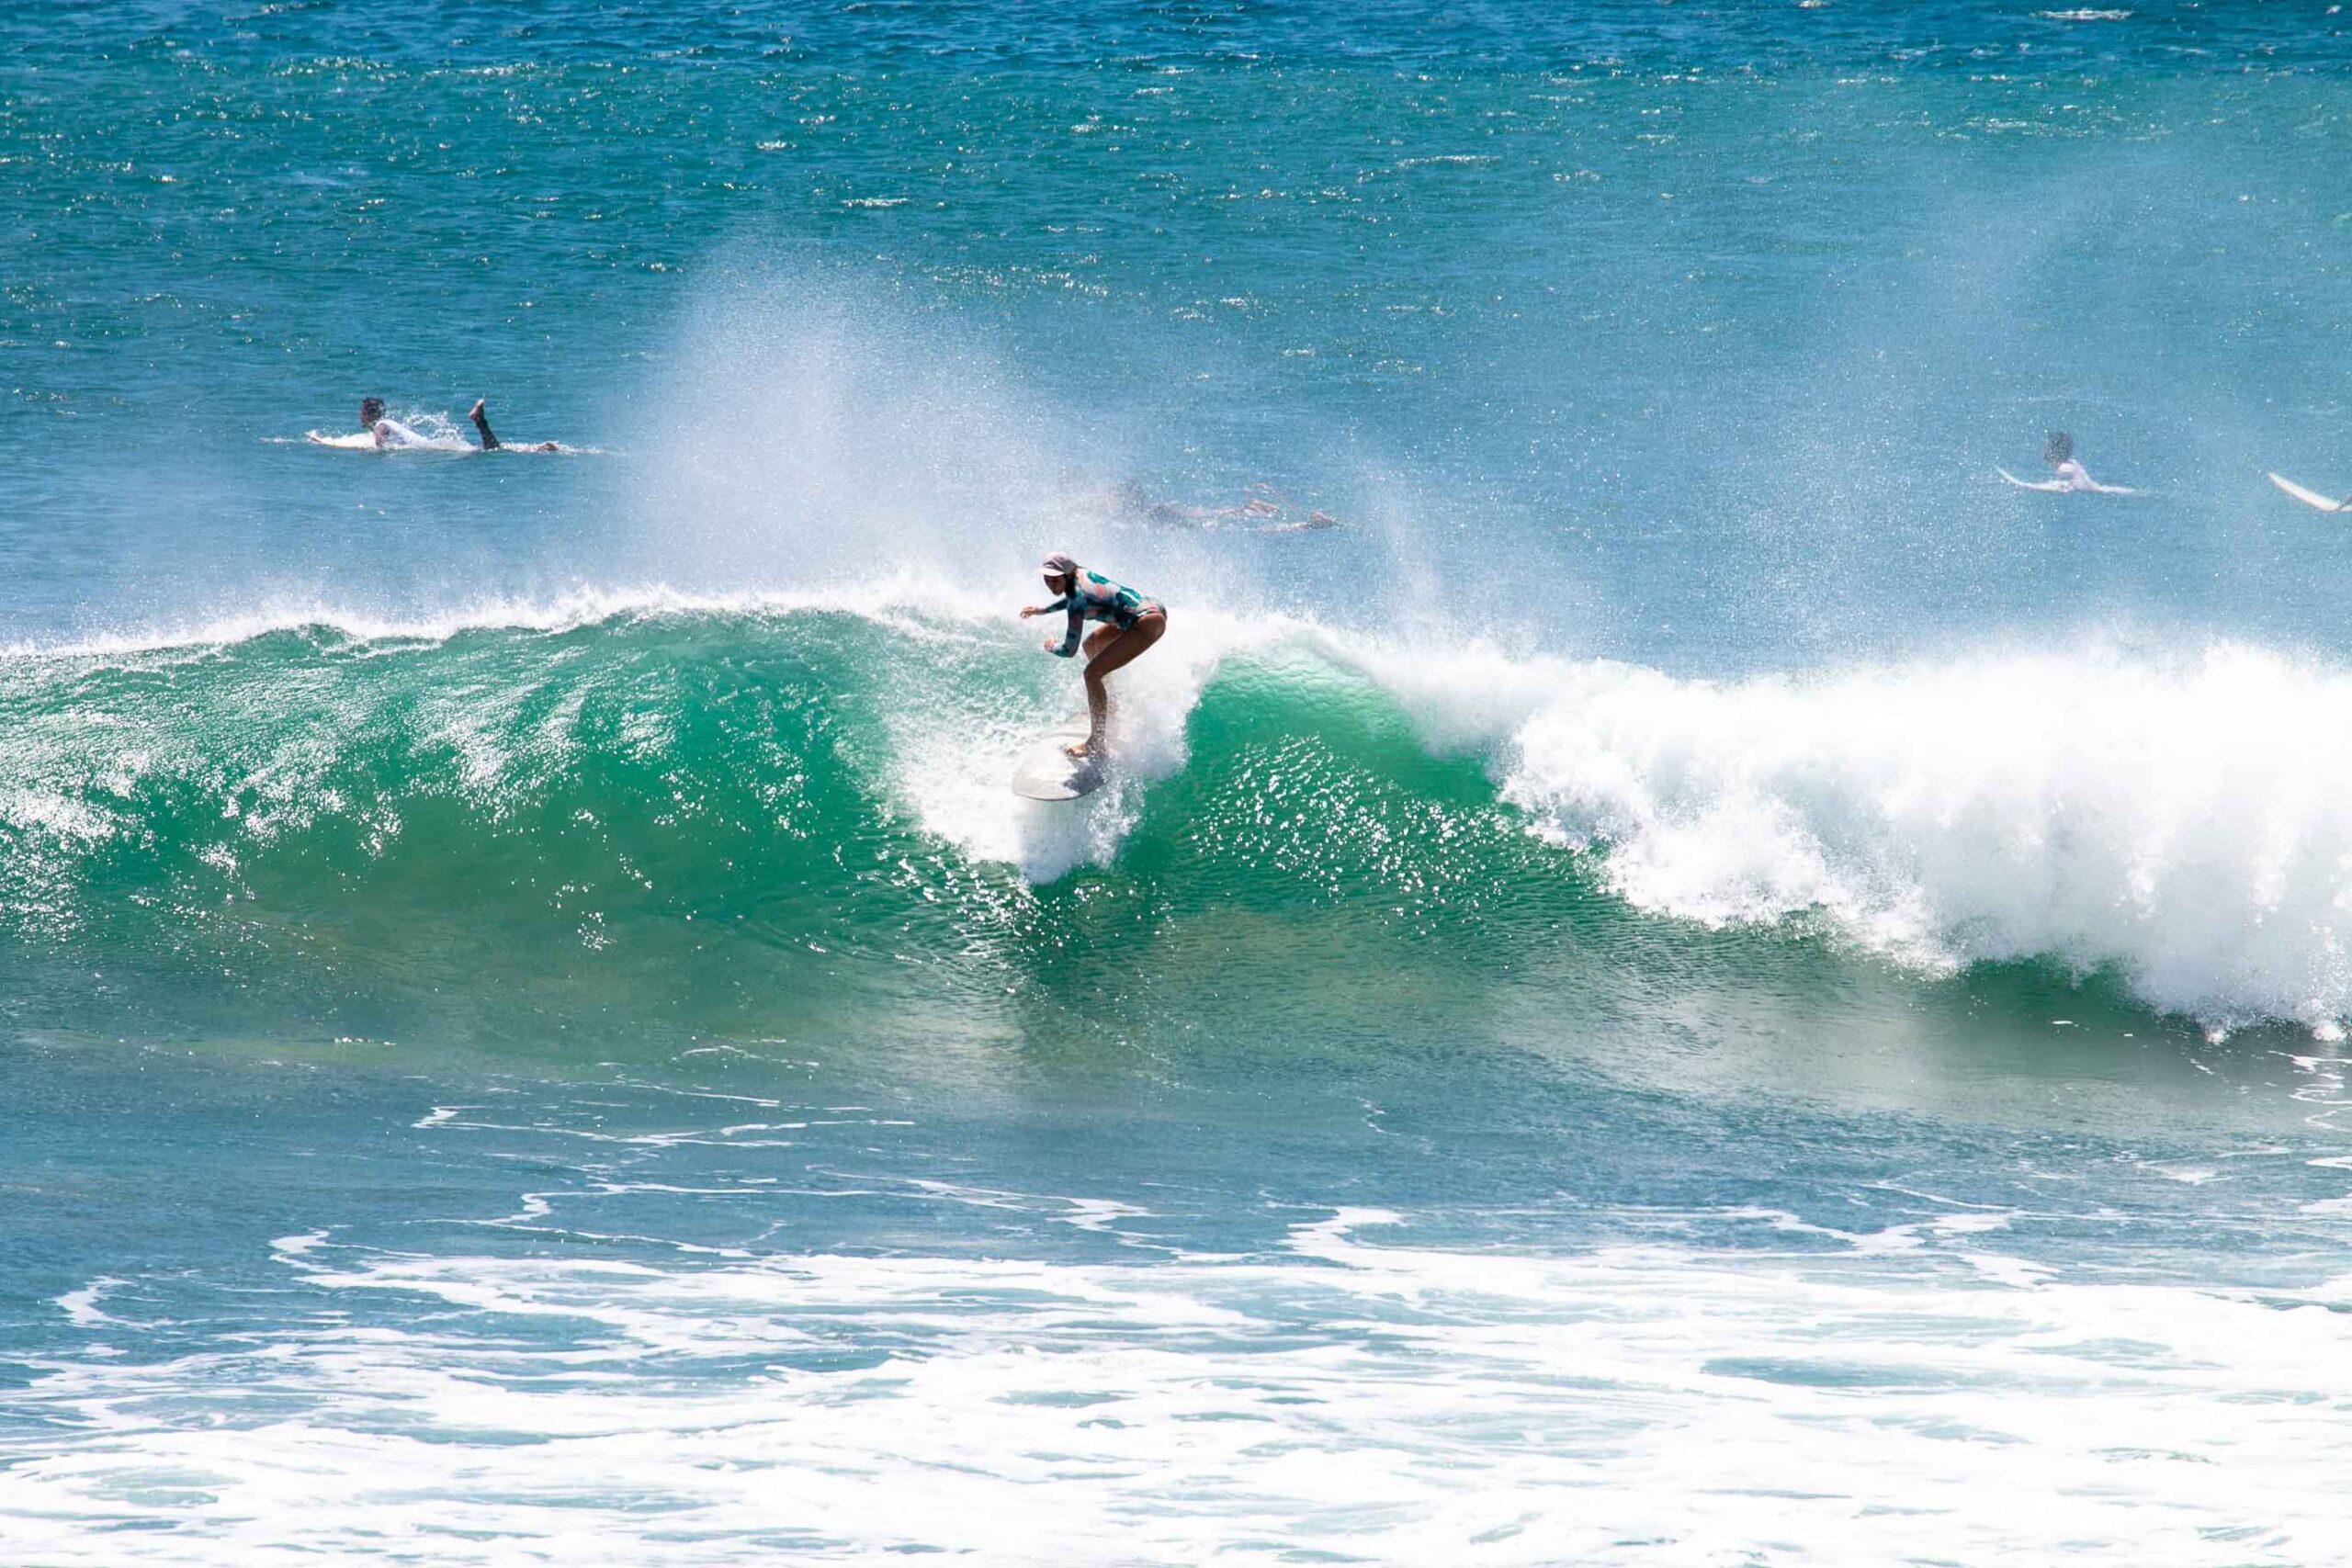 Surfing Popoyo main break in Nicaragua